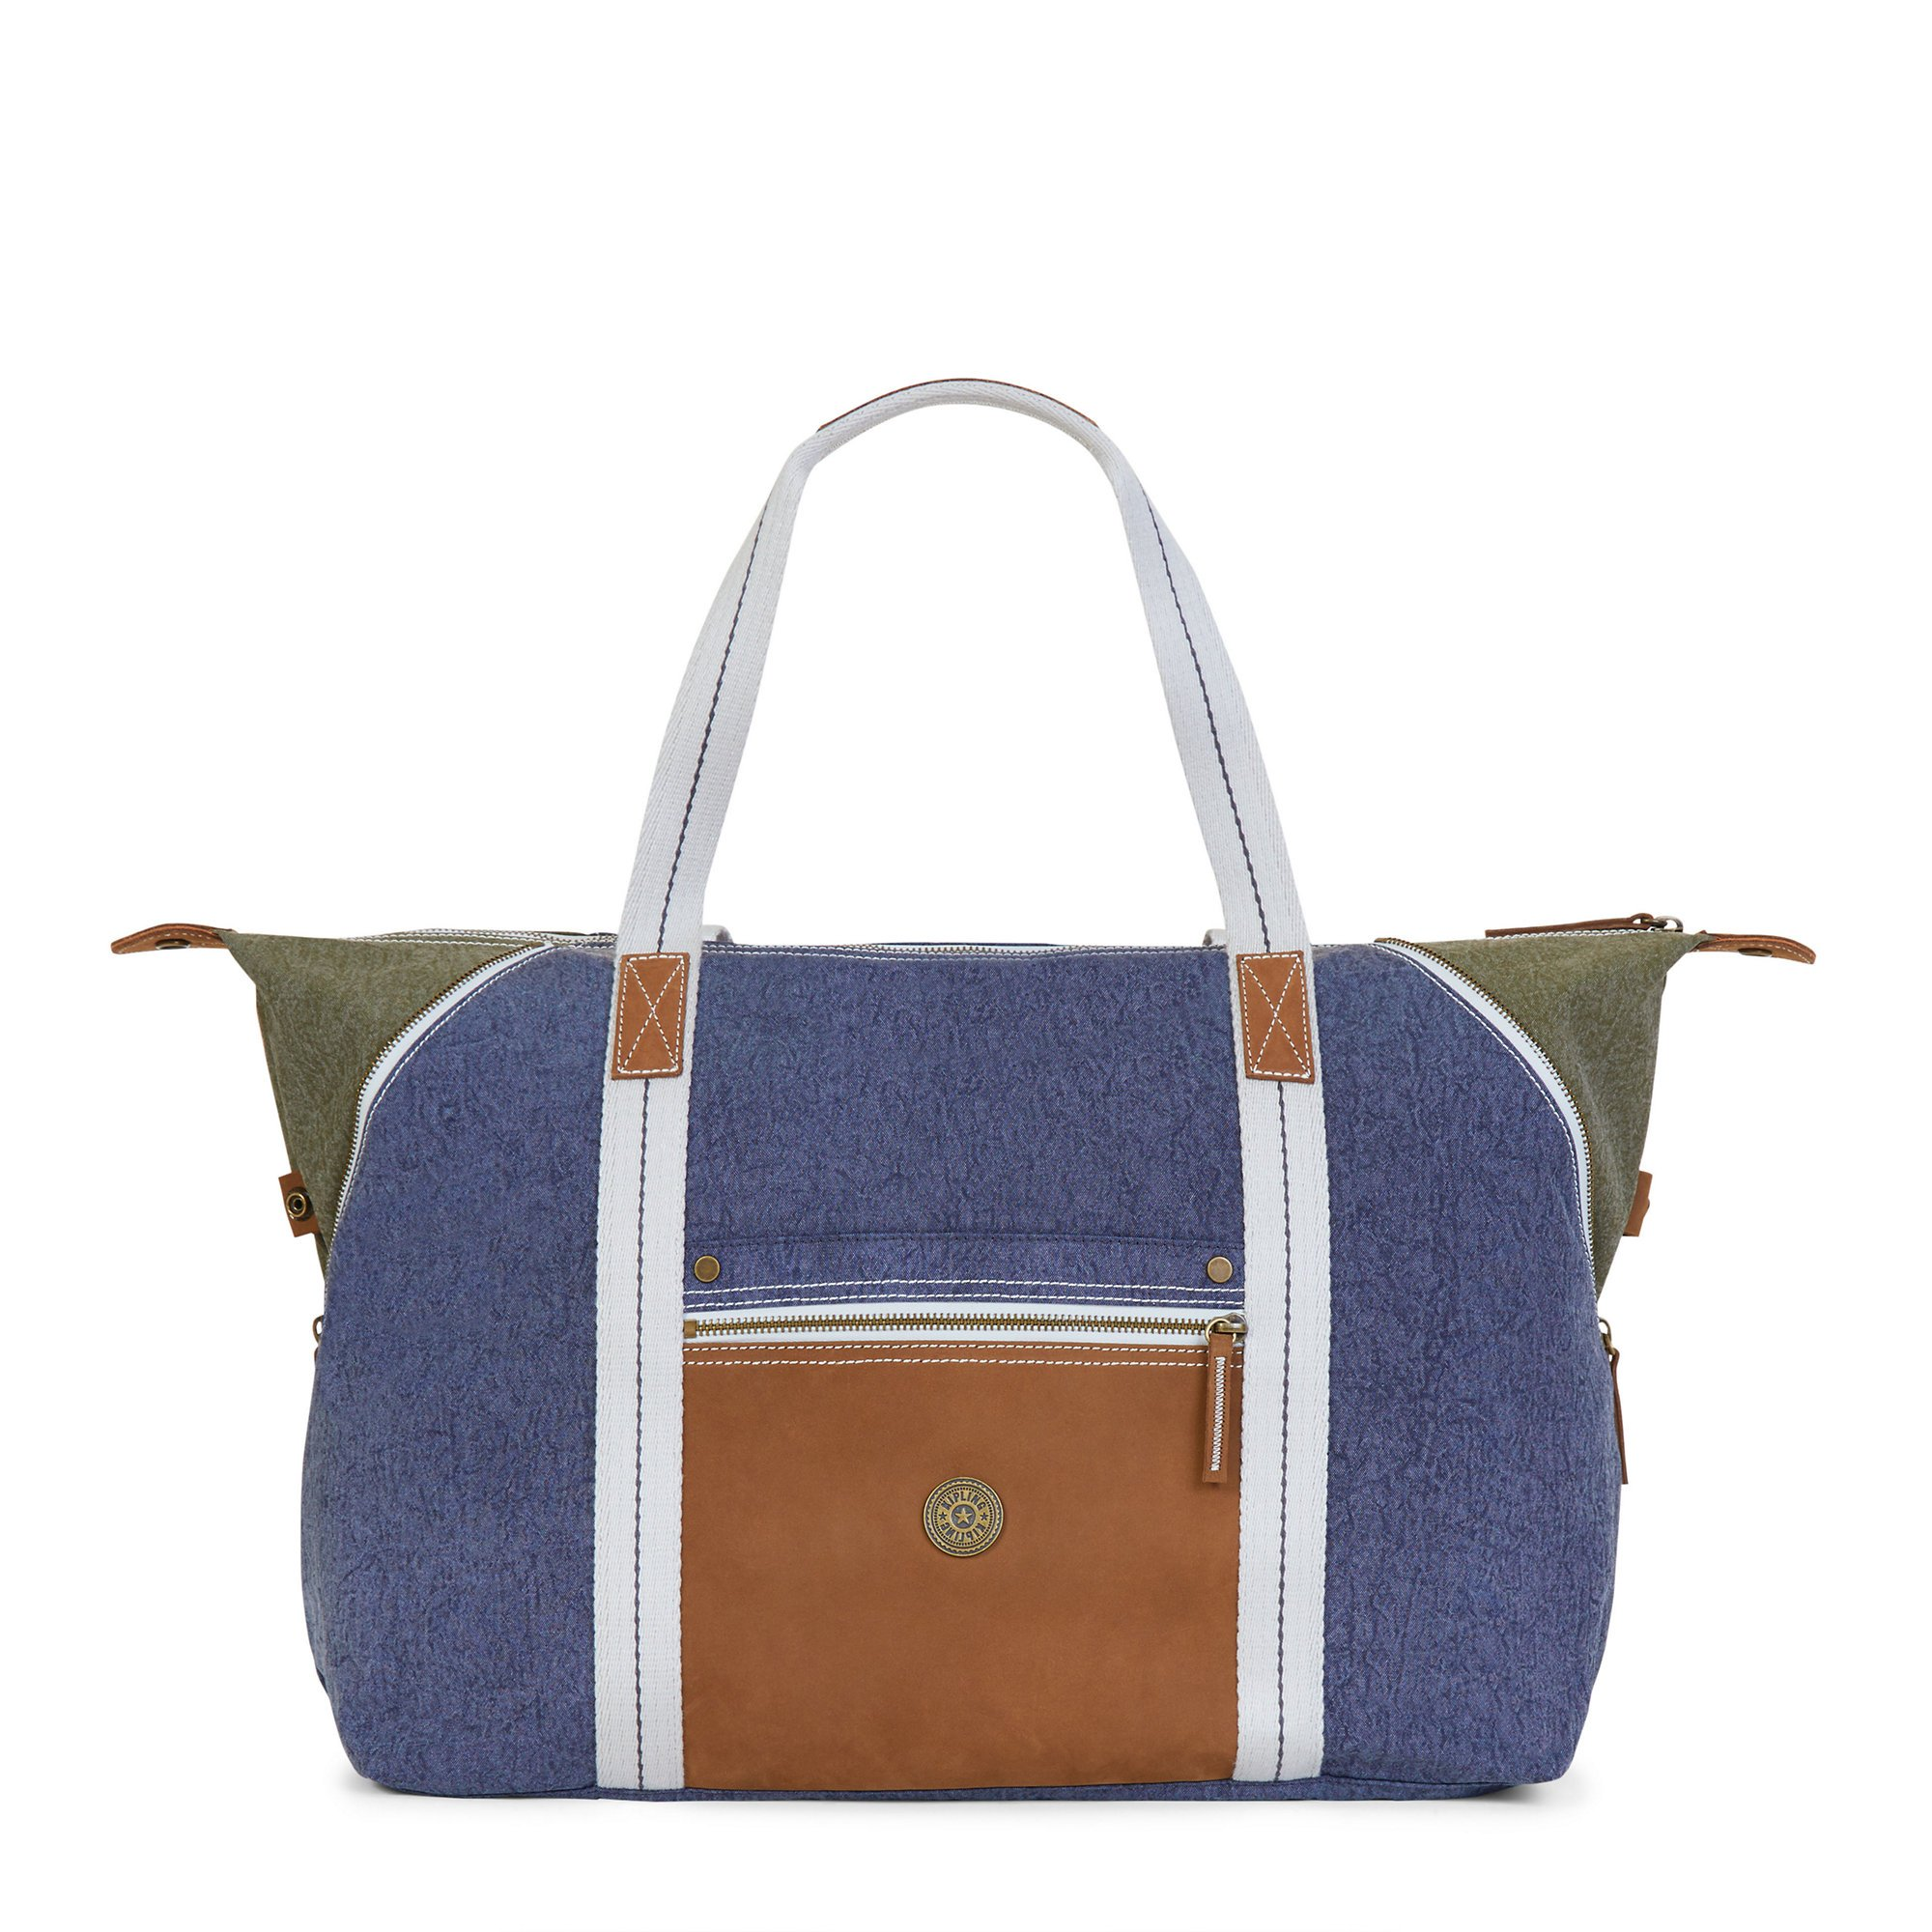 Kipling Women's Art M Tote Bag One Size Aged Block